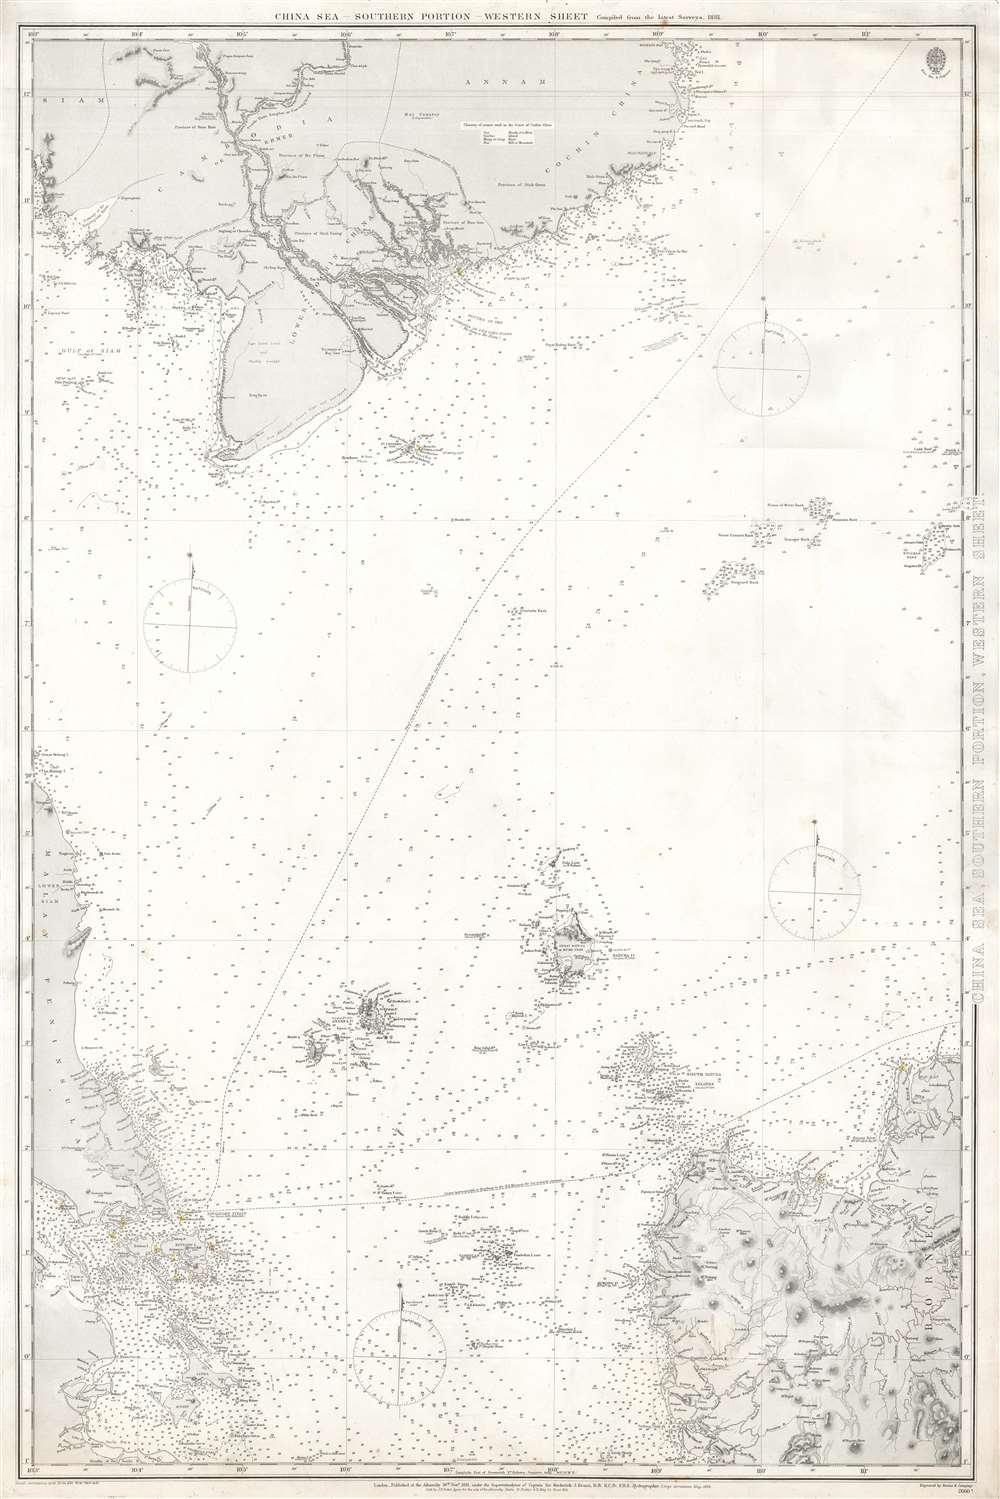 China Sea, Southern Portion, Western Sheet.